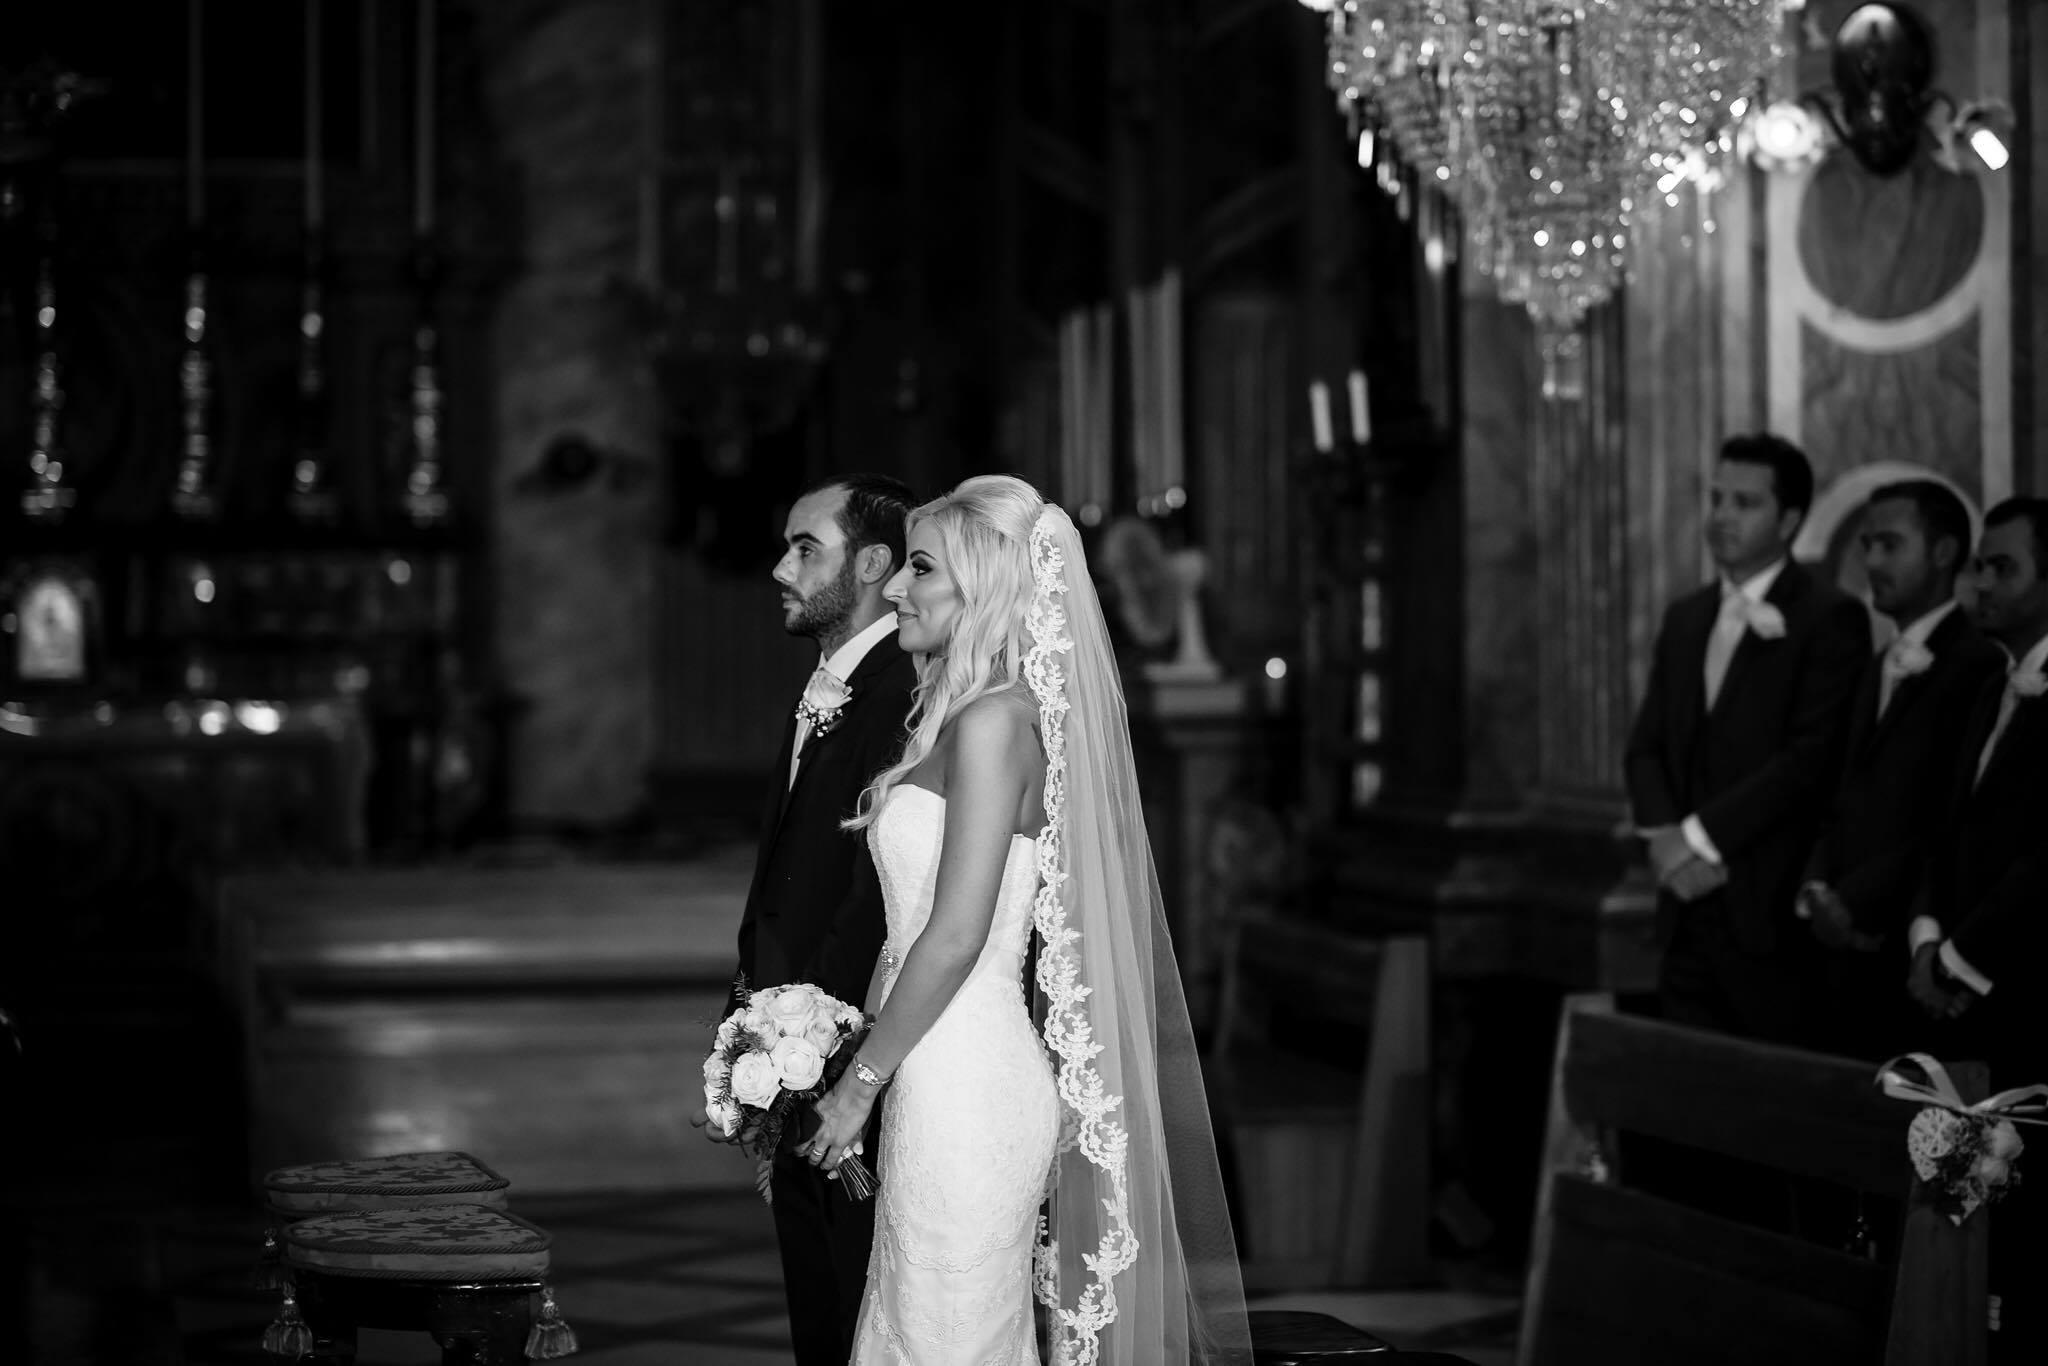 Marelda chapel length lace veil